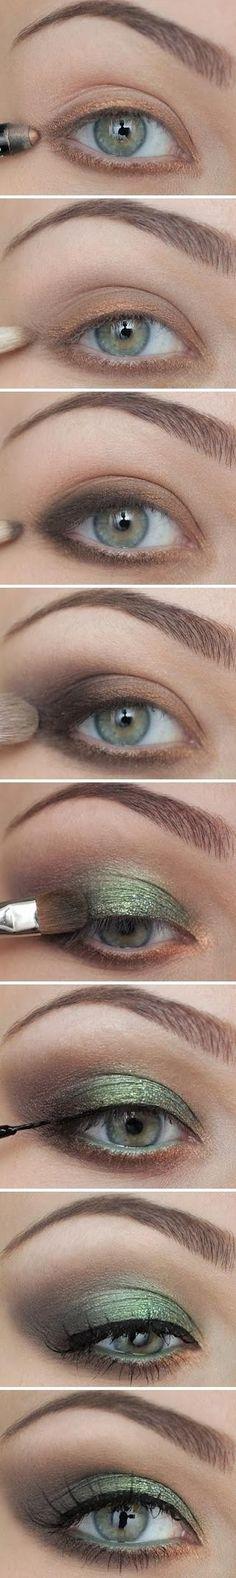 Eyey makeup by Mandi